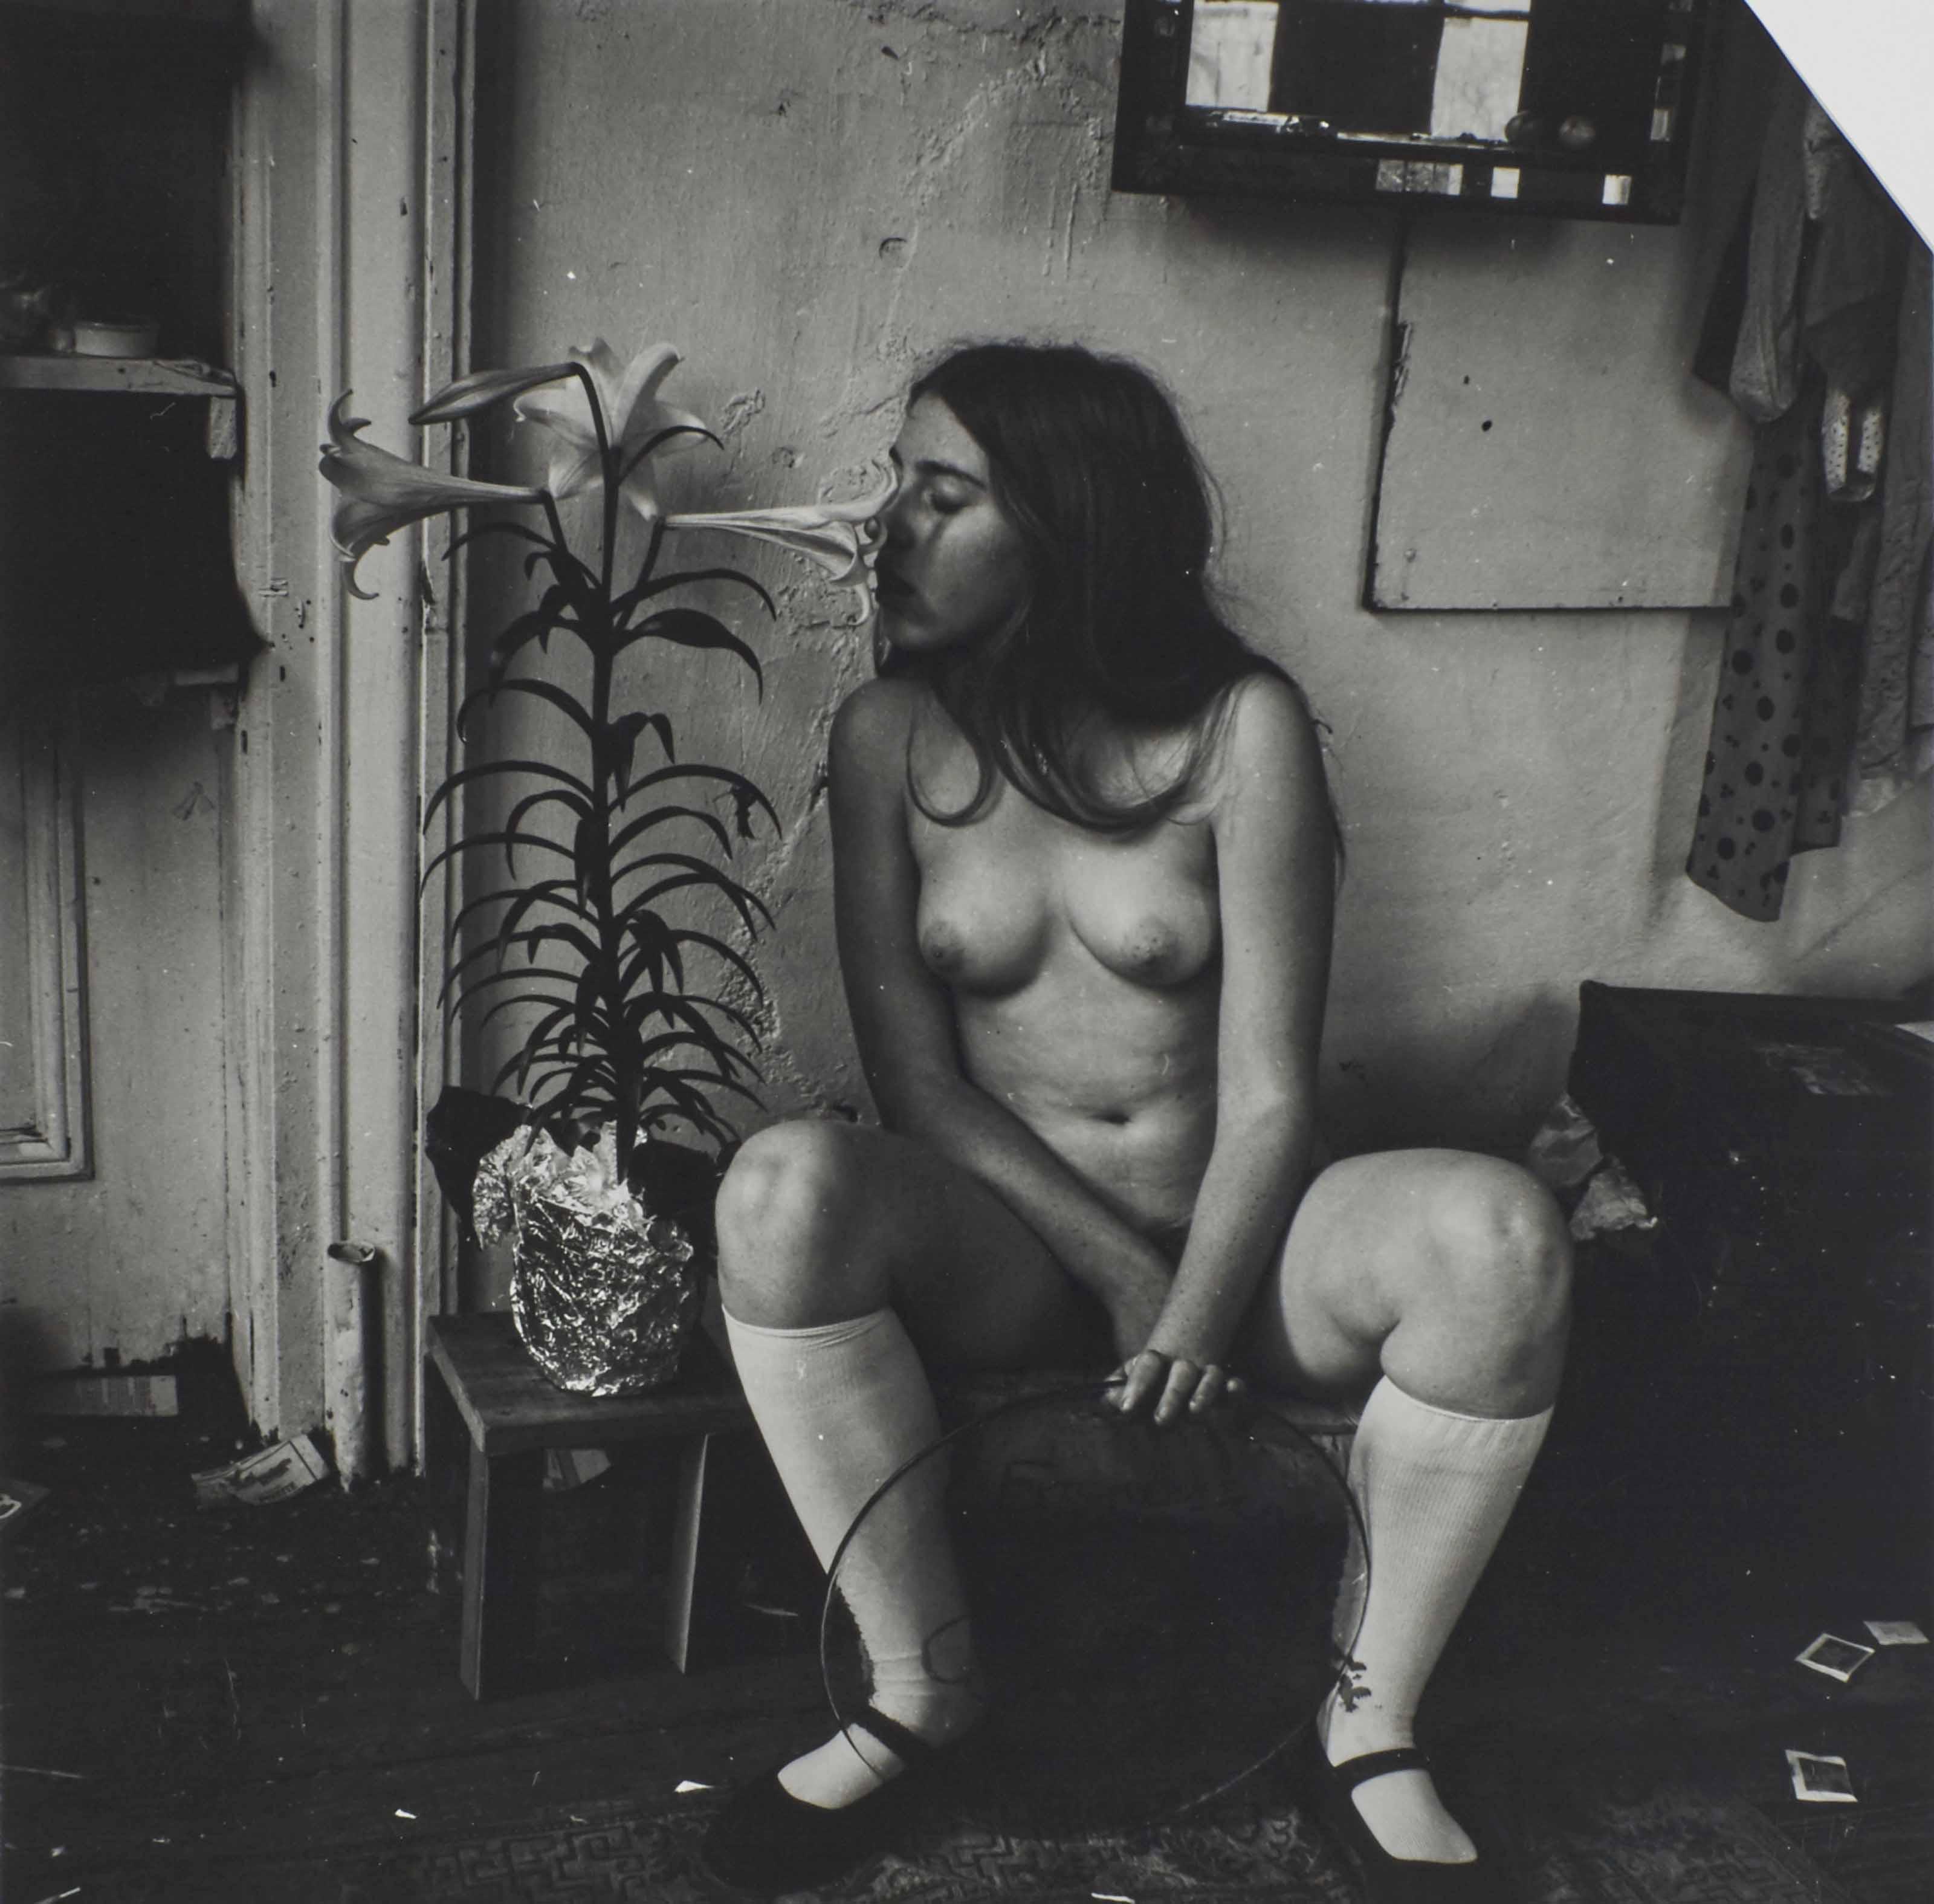 E.2.1 (Self-Portrait with Lily), 1972-75